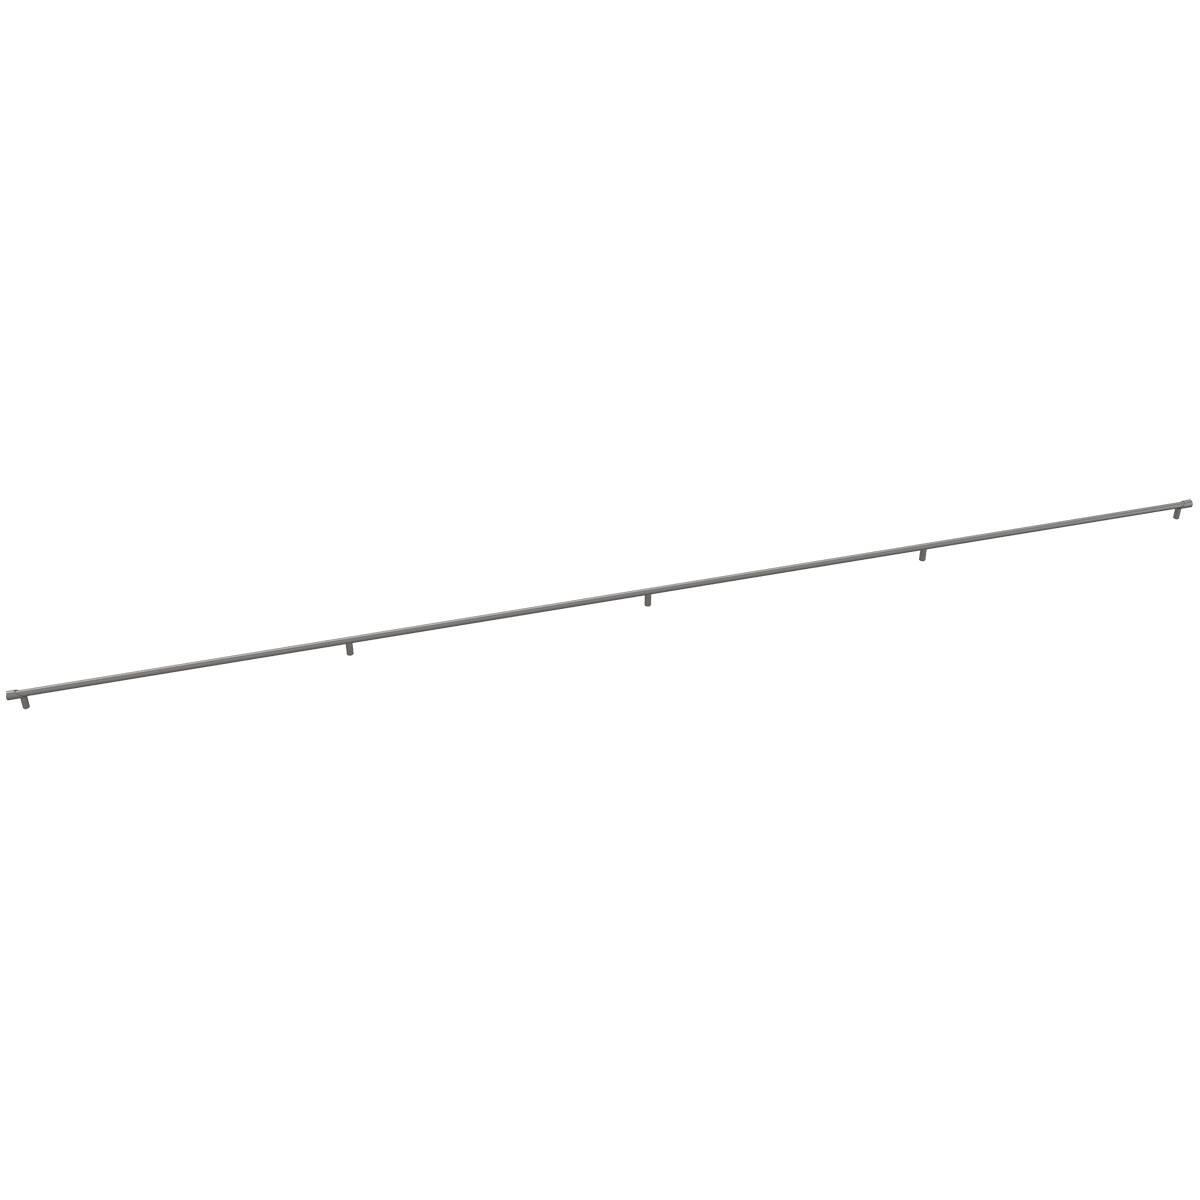 Ручка скоба 8.1149.1794.0238-0238